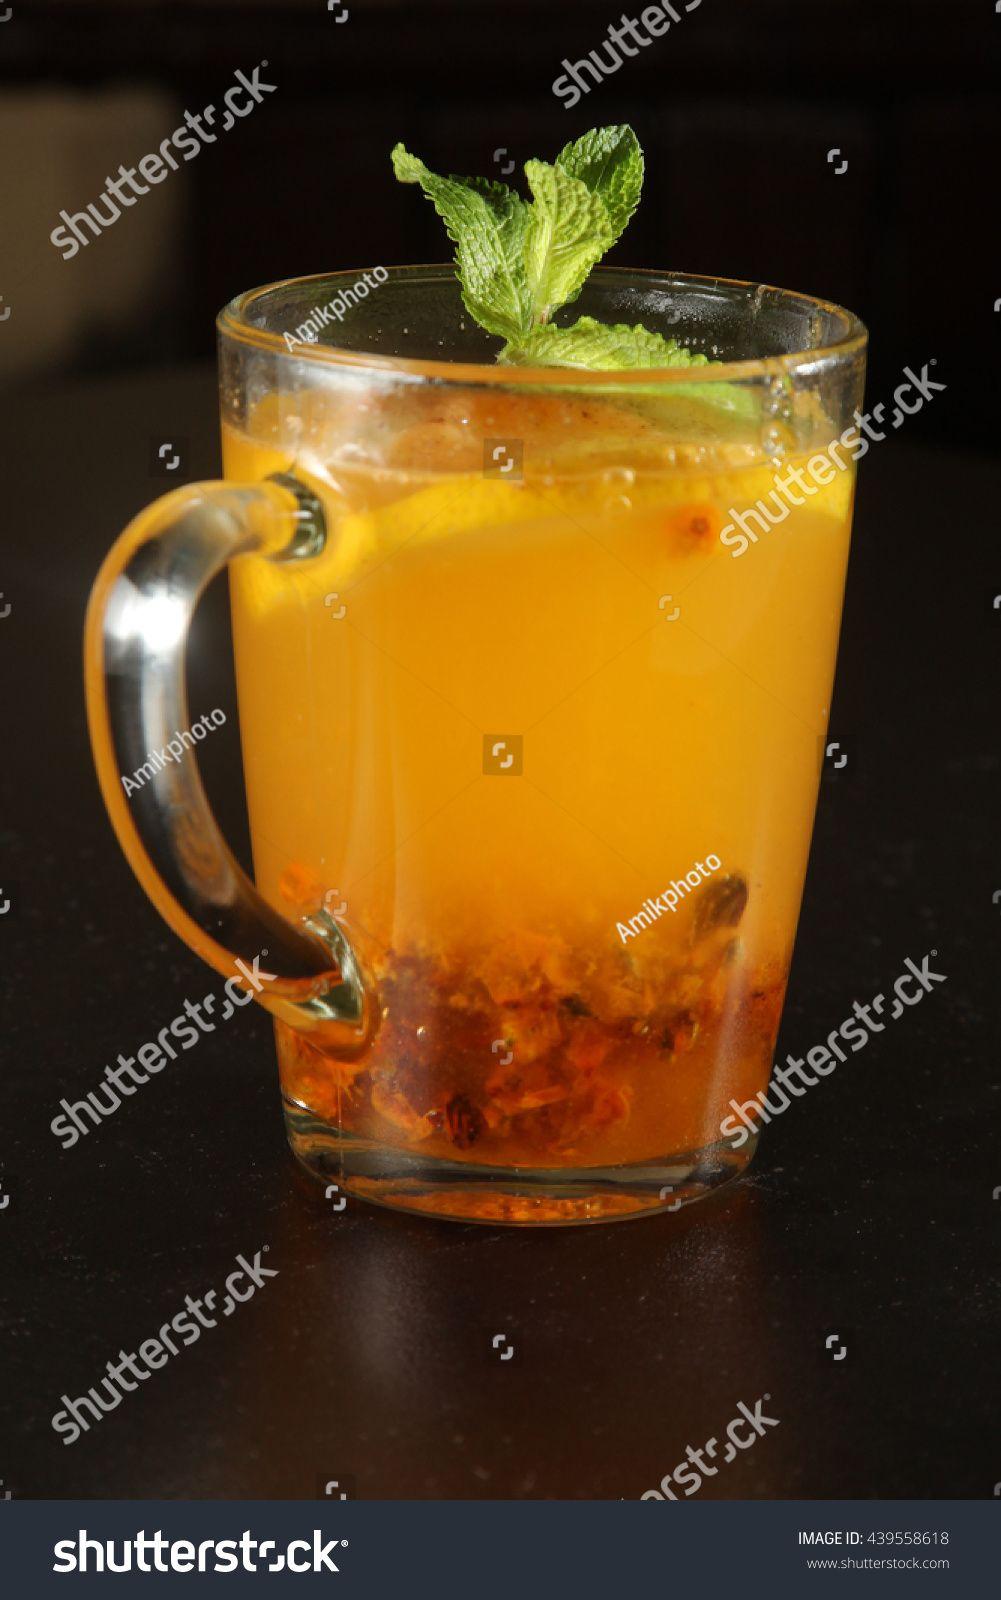 seabuckthorn drink in glass on black background #Sponsored , #spon, #drink#seabuckthorn#glass#background